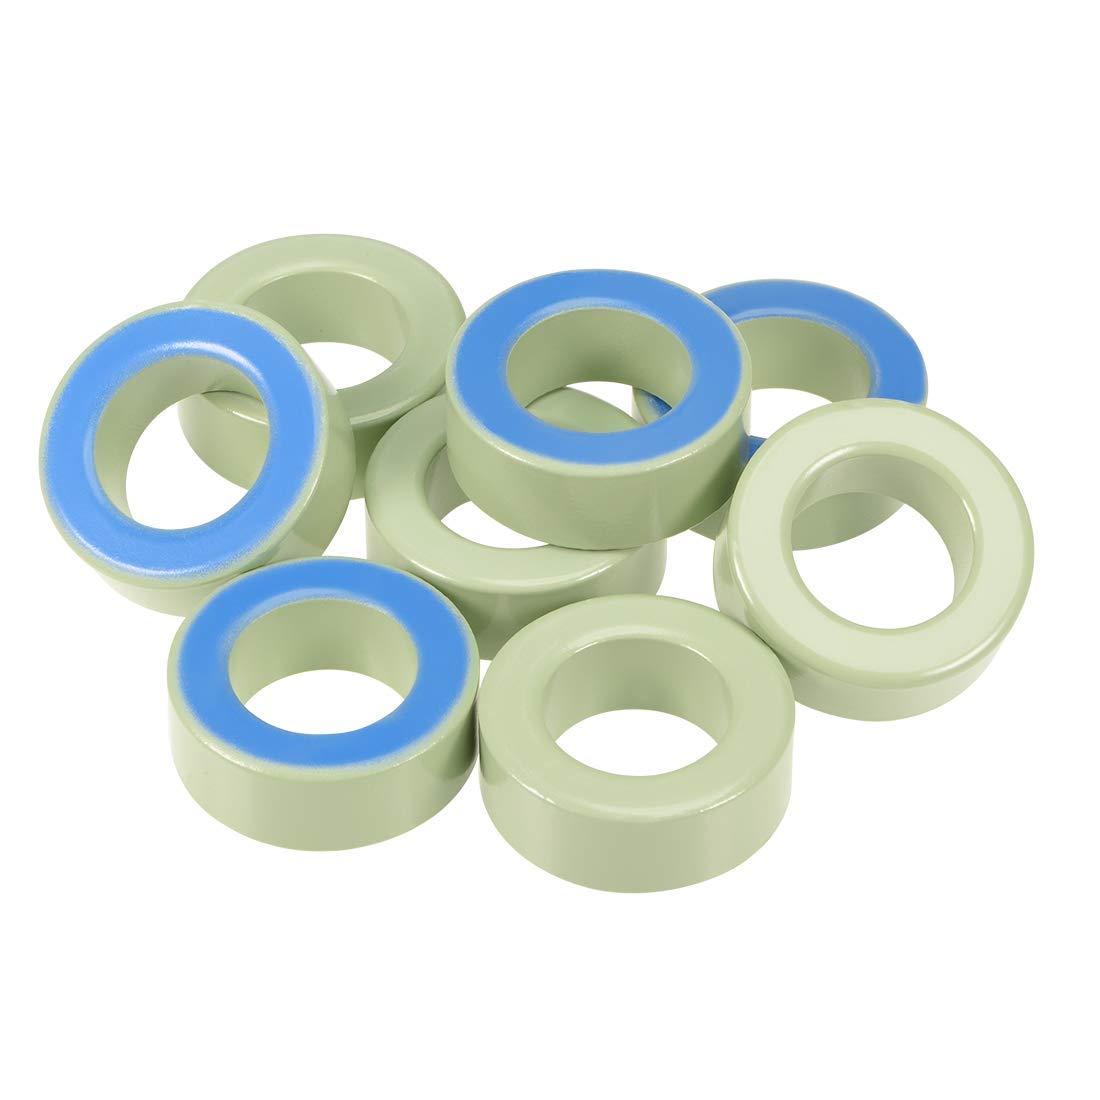 ZCHXD Toroid Core, Ferrite Chokes Ring Iron Powder Inductor Ferrite Rings, Light Green Blue 8pcs, 26.9 x 45 x 16.8mm